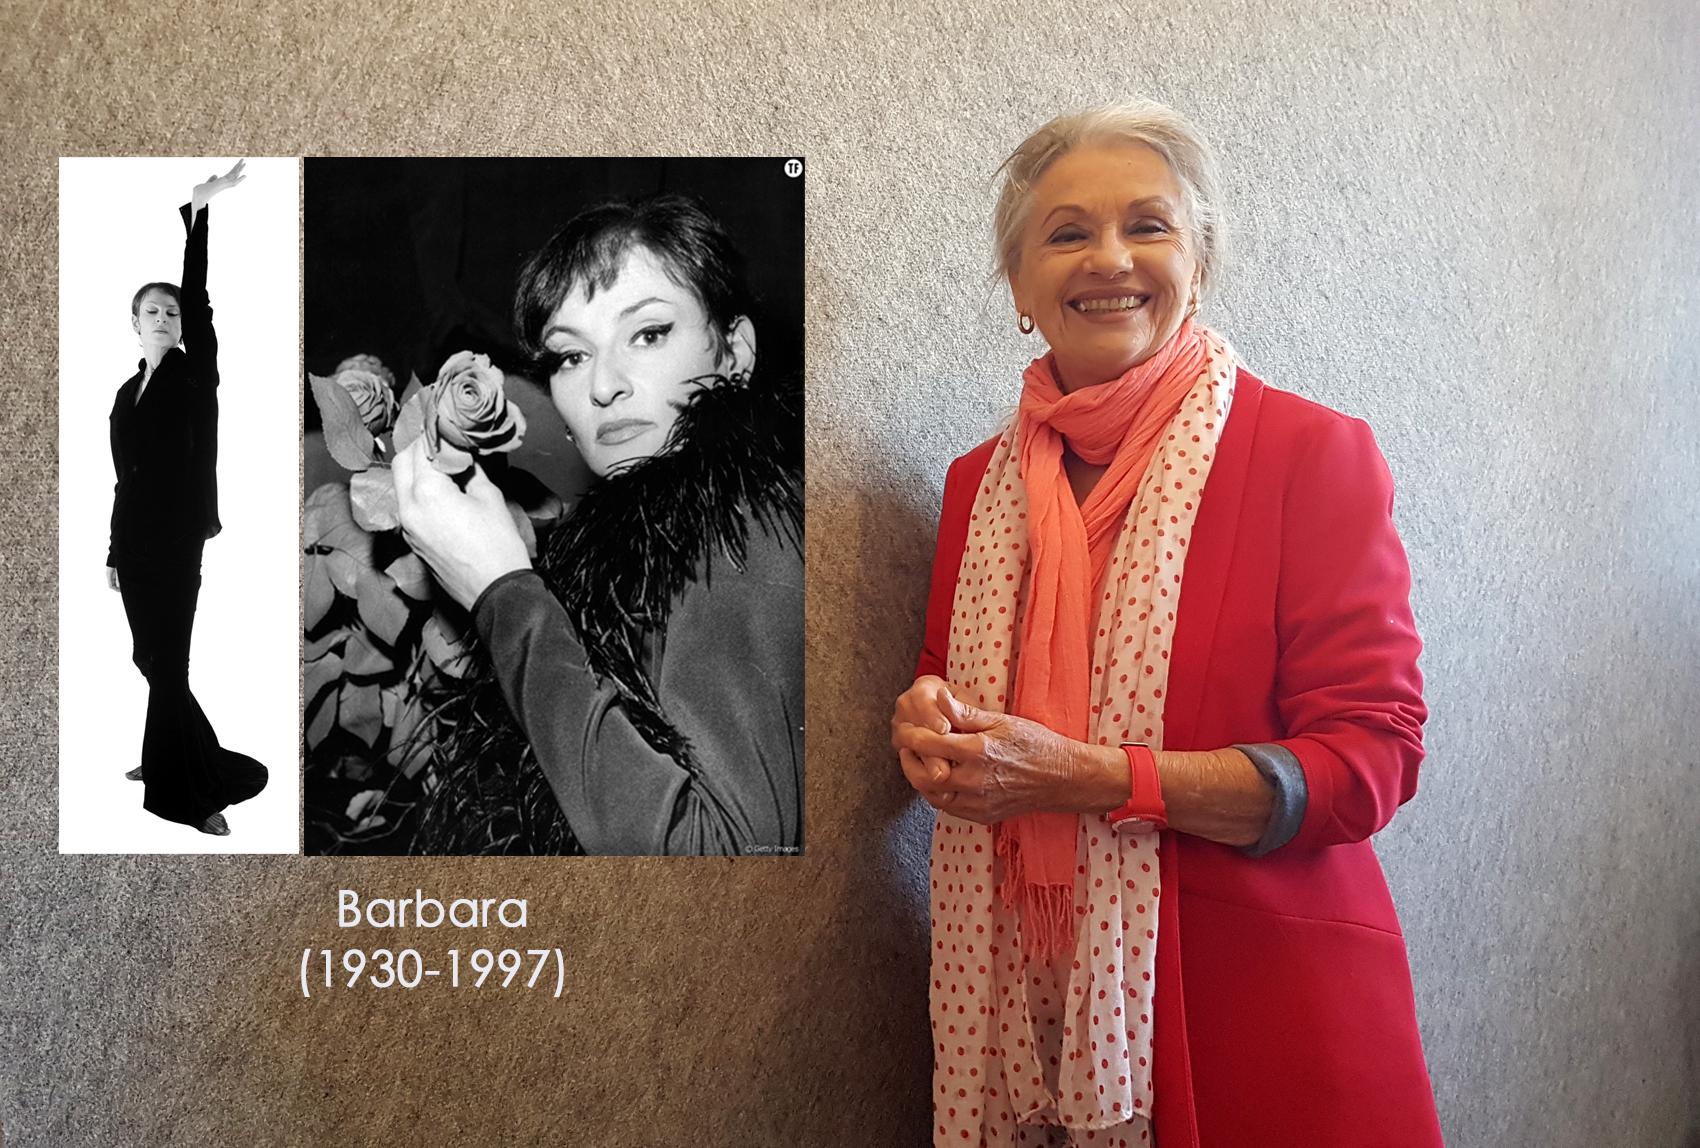 Barbara et Jacqueline Hennegrave